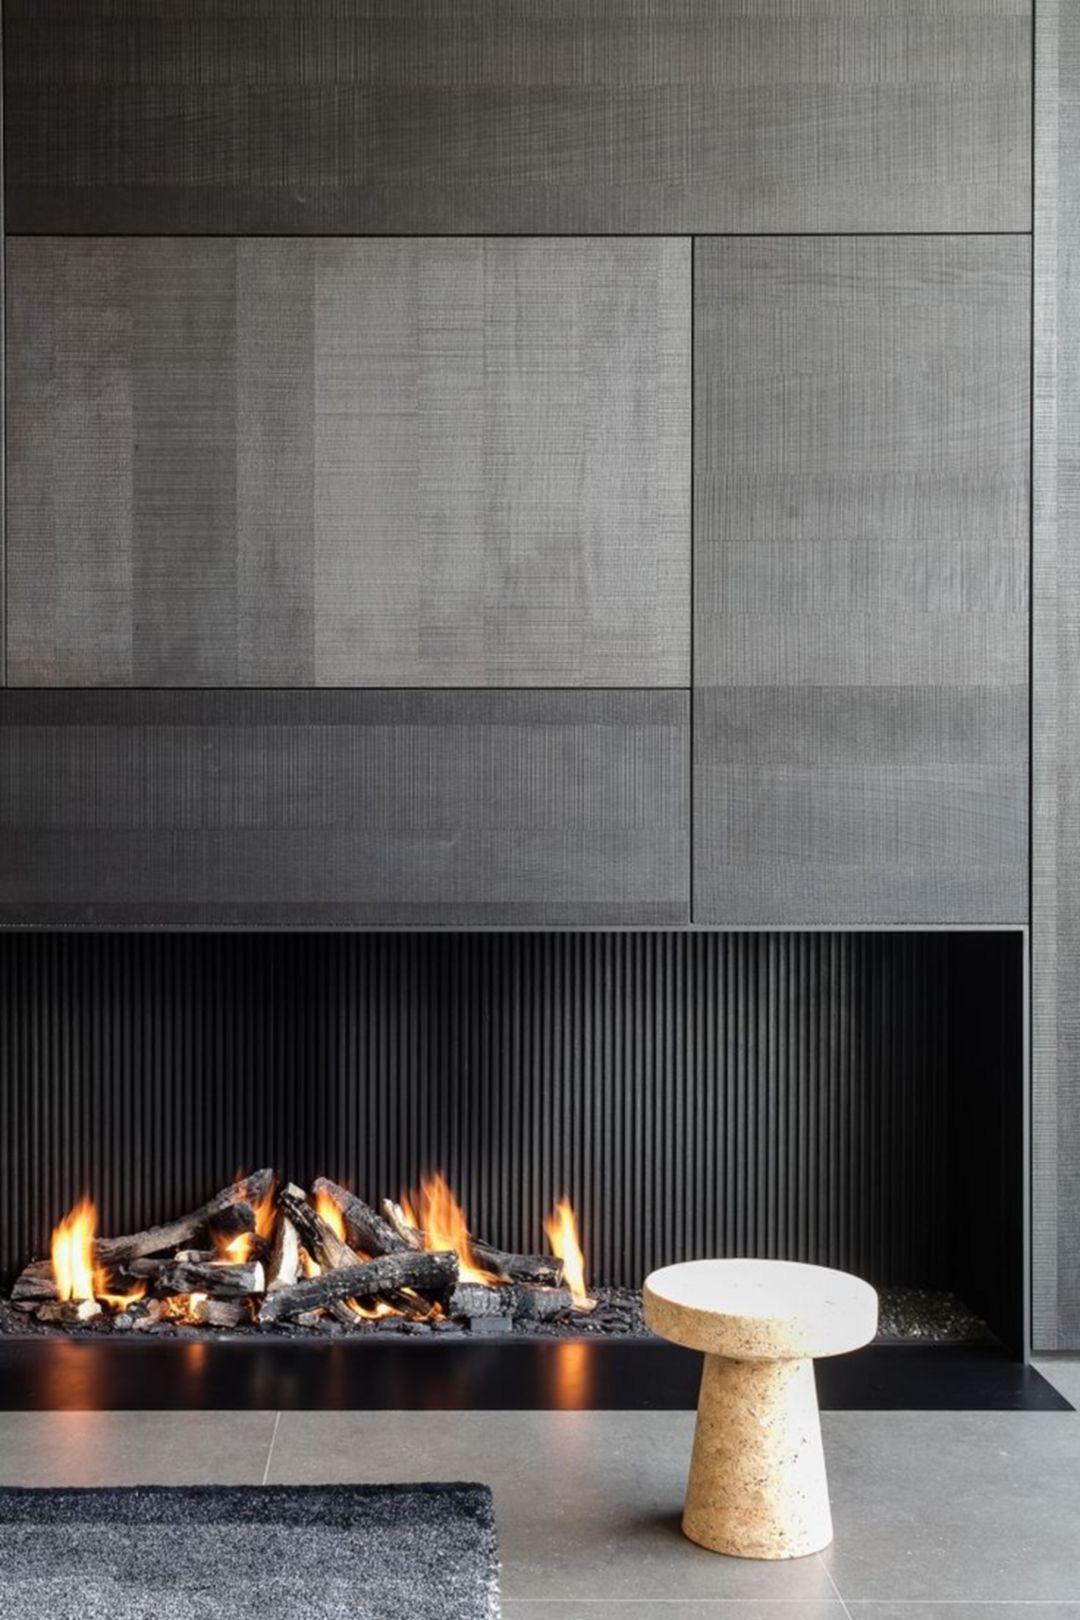 10 Extraordinary Fireplace Designs For The Cozy Home #modernfireplaceideas